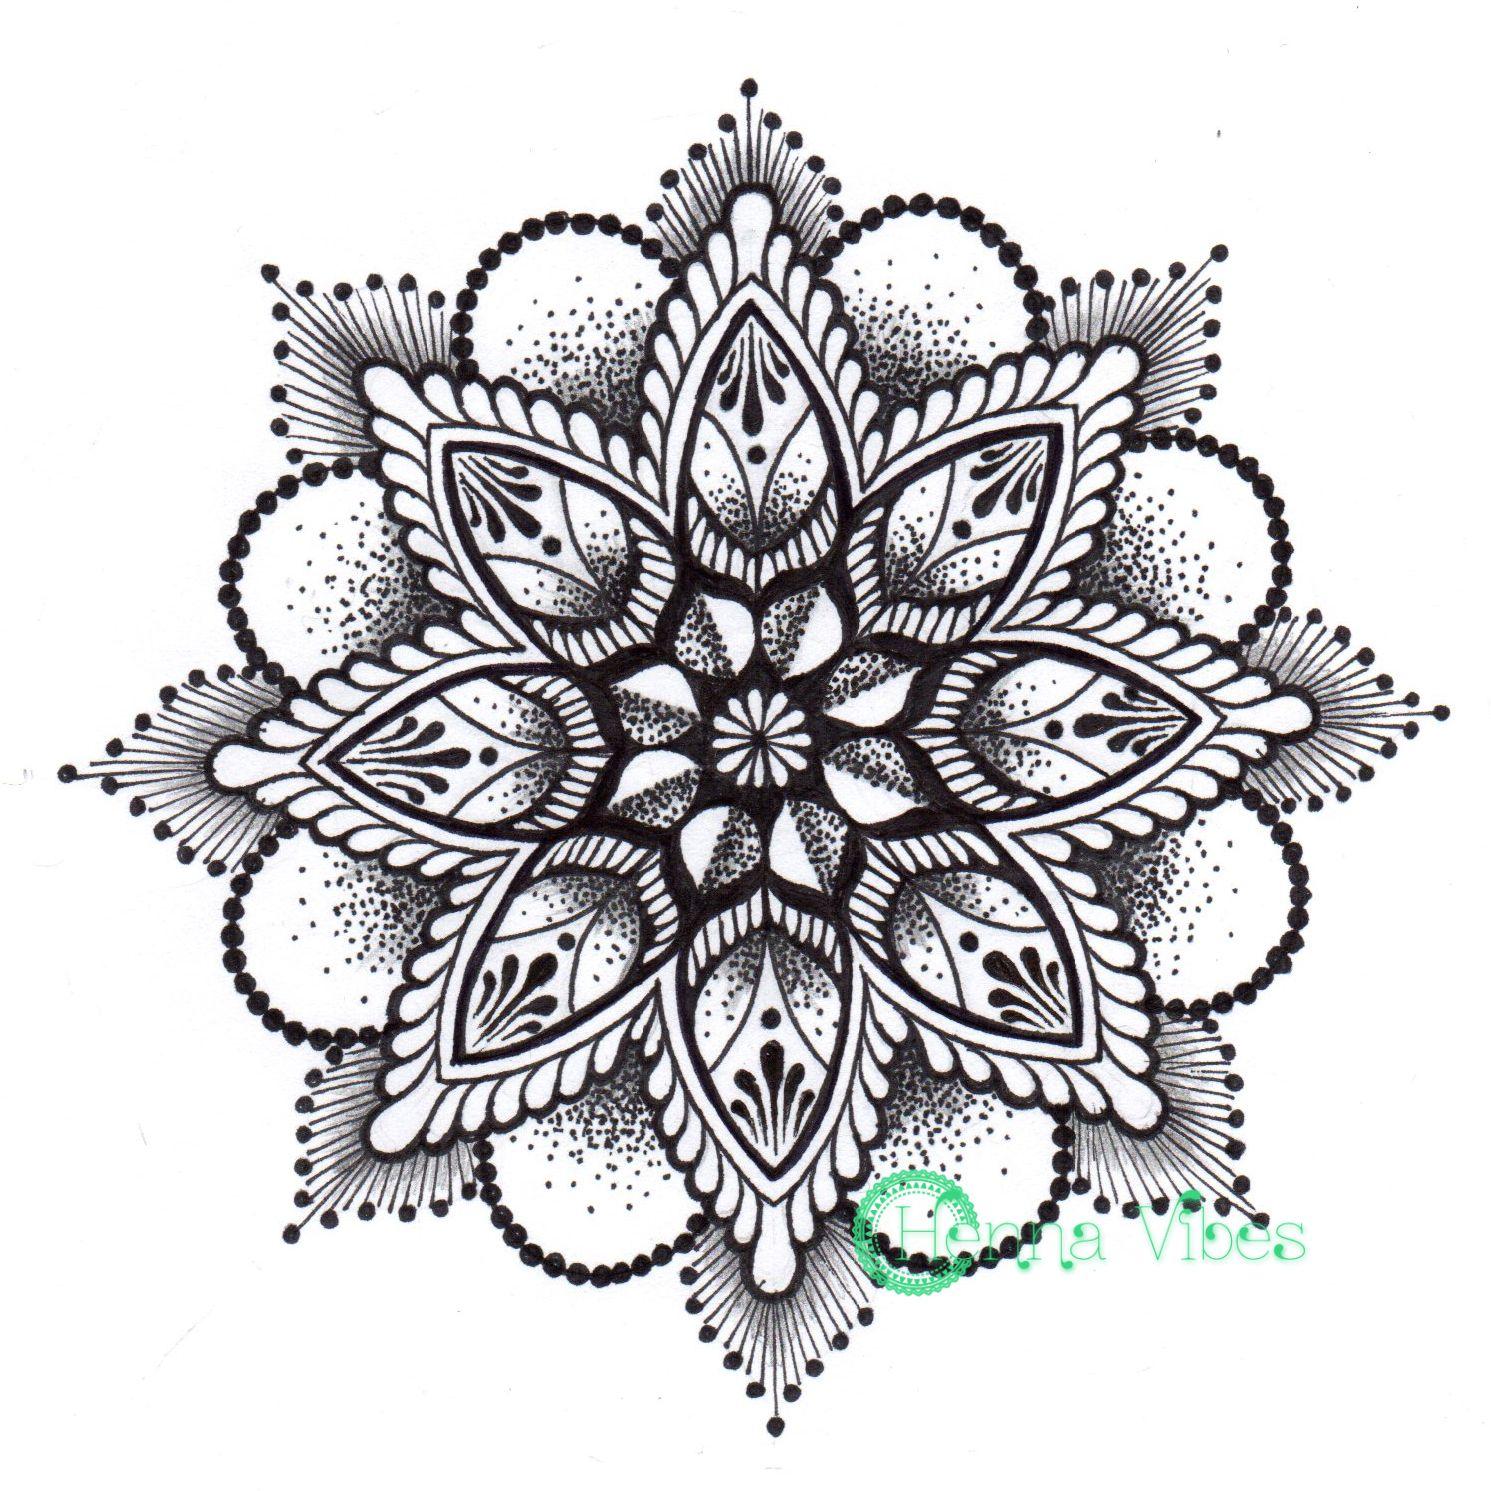 Mehndi Tattoo Mandala : Dotwork mandala by mish at henna vibes body art